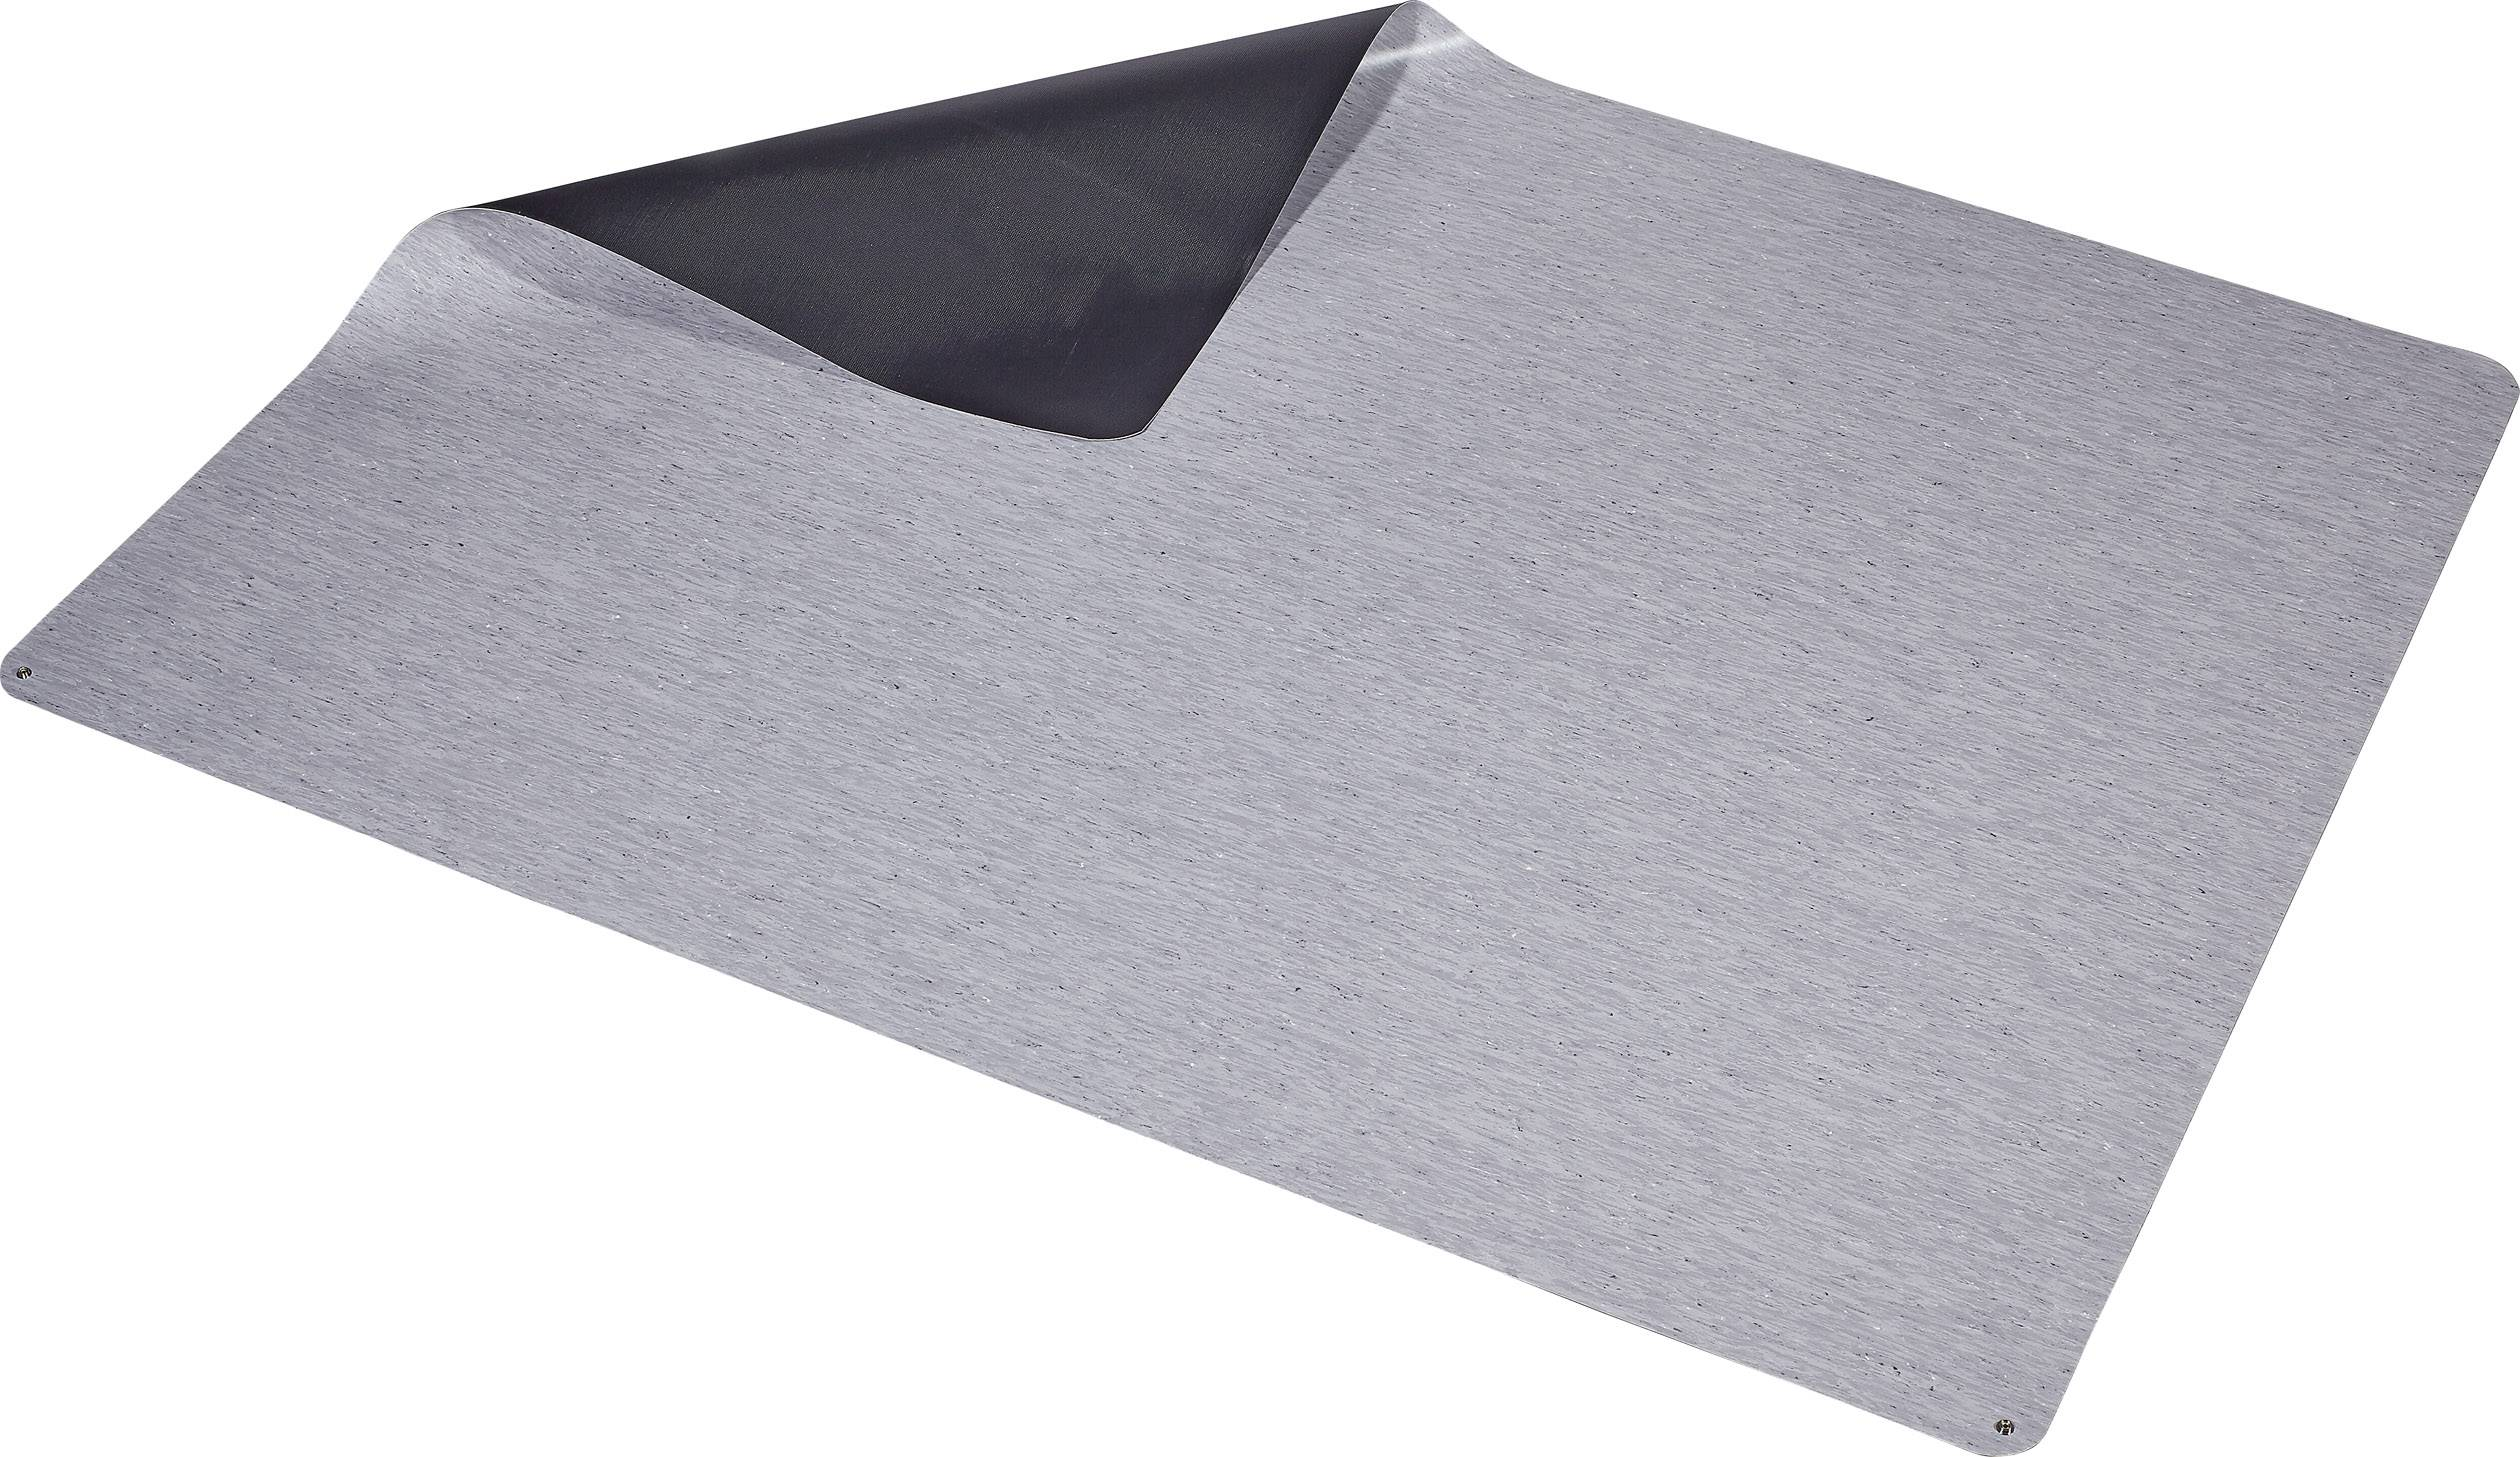 ESD podlahová rohož Wolfgang Warmbier 1250.47002.L, (d x š x v) 2000 x 1500 x 2 mm, šedá